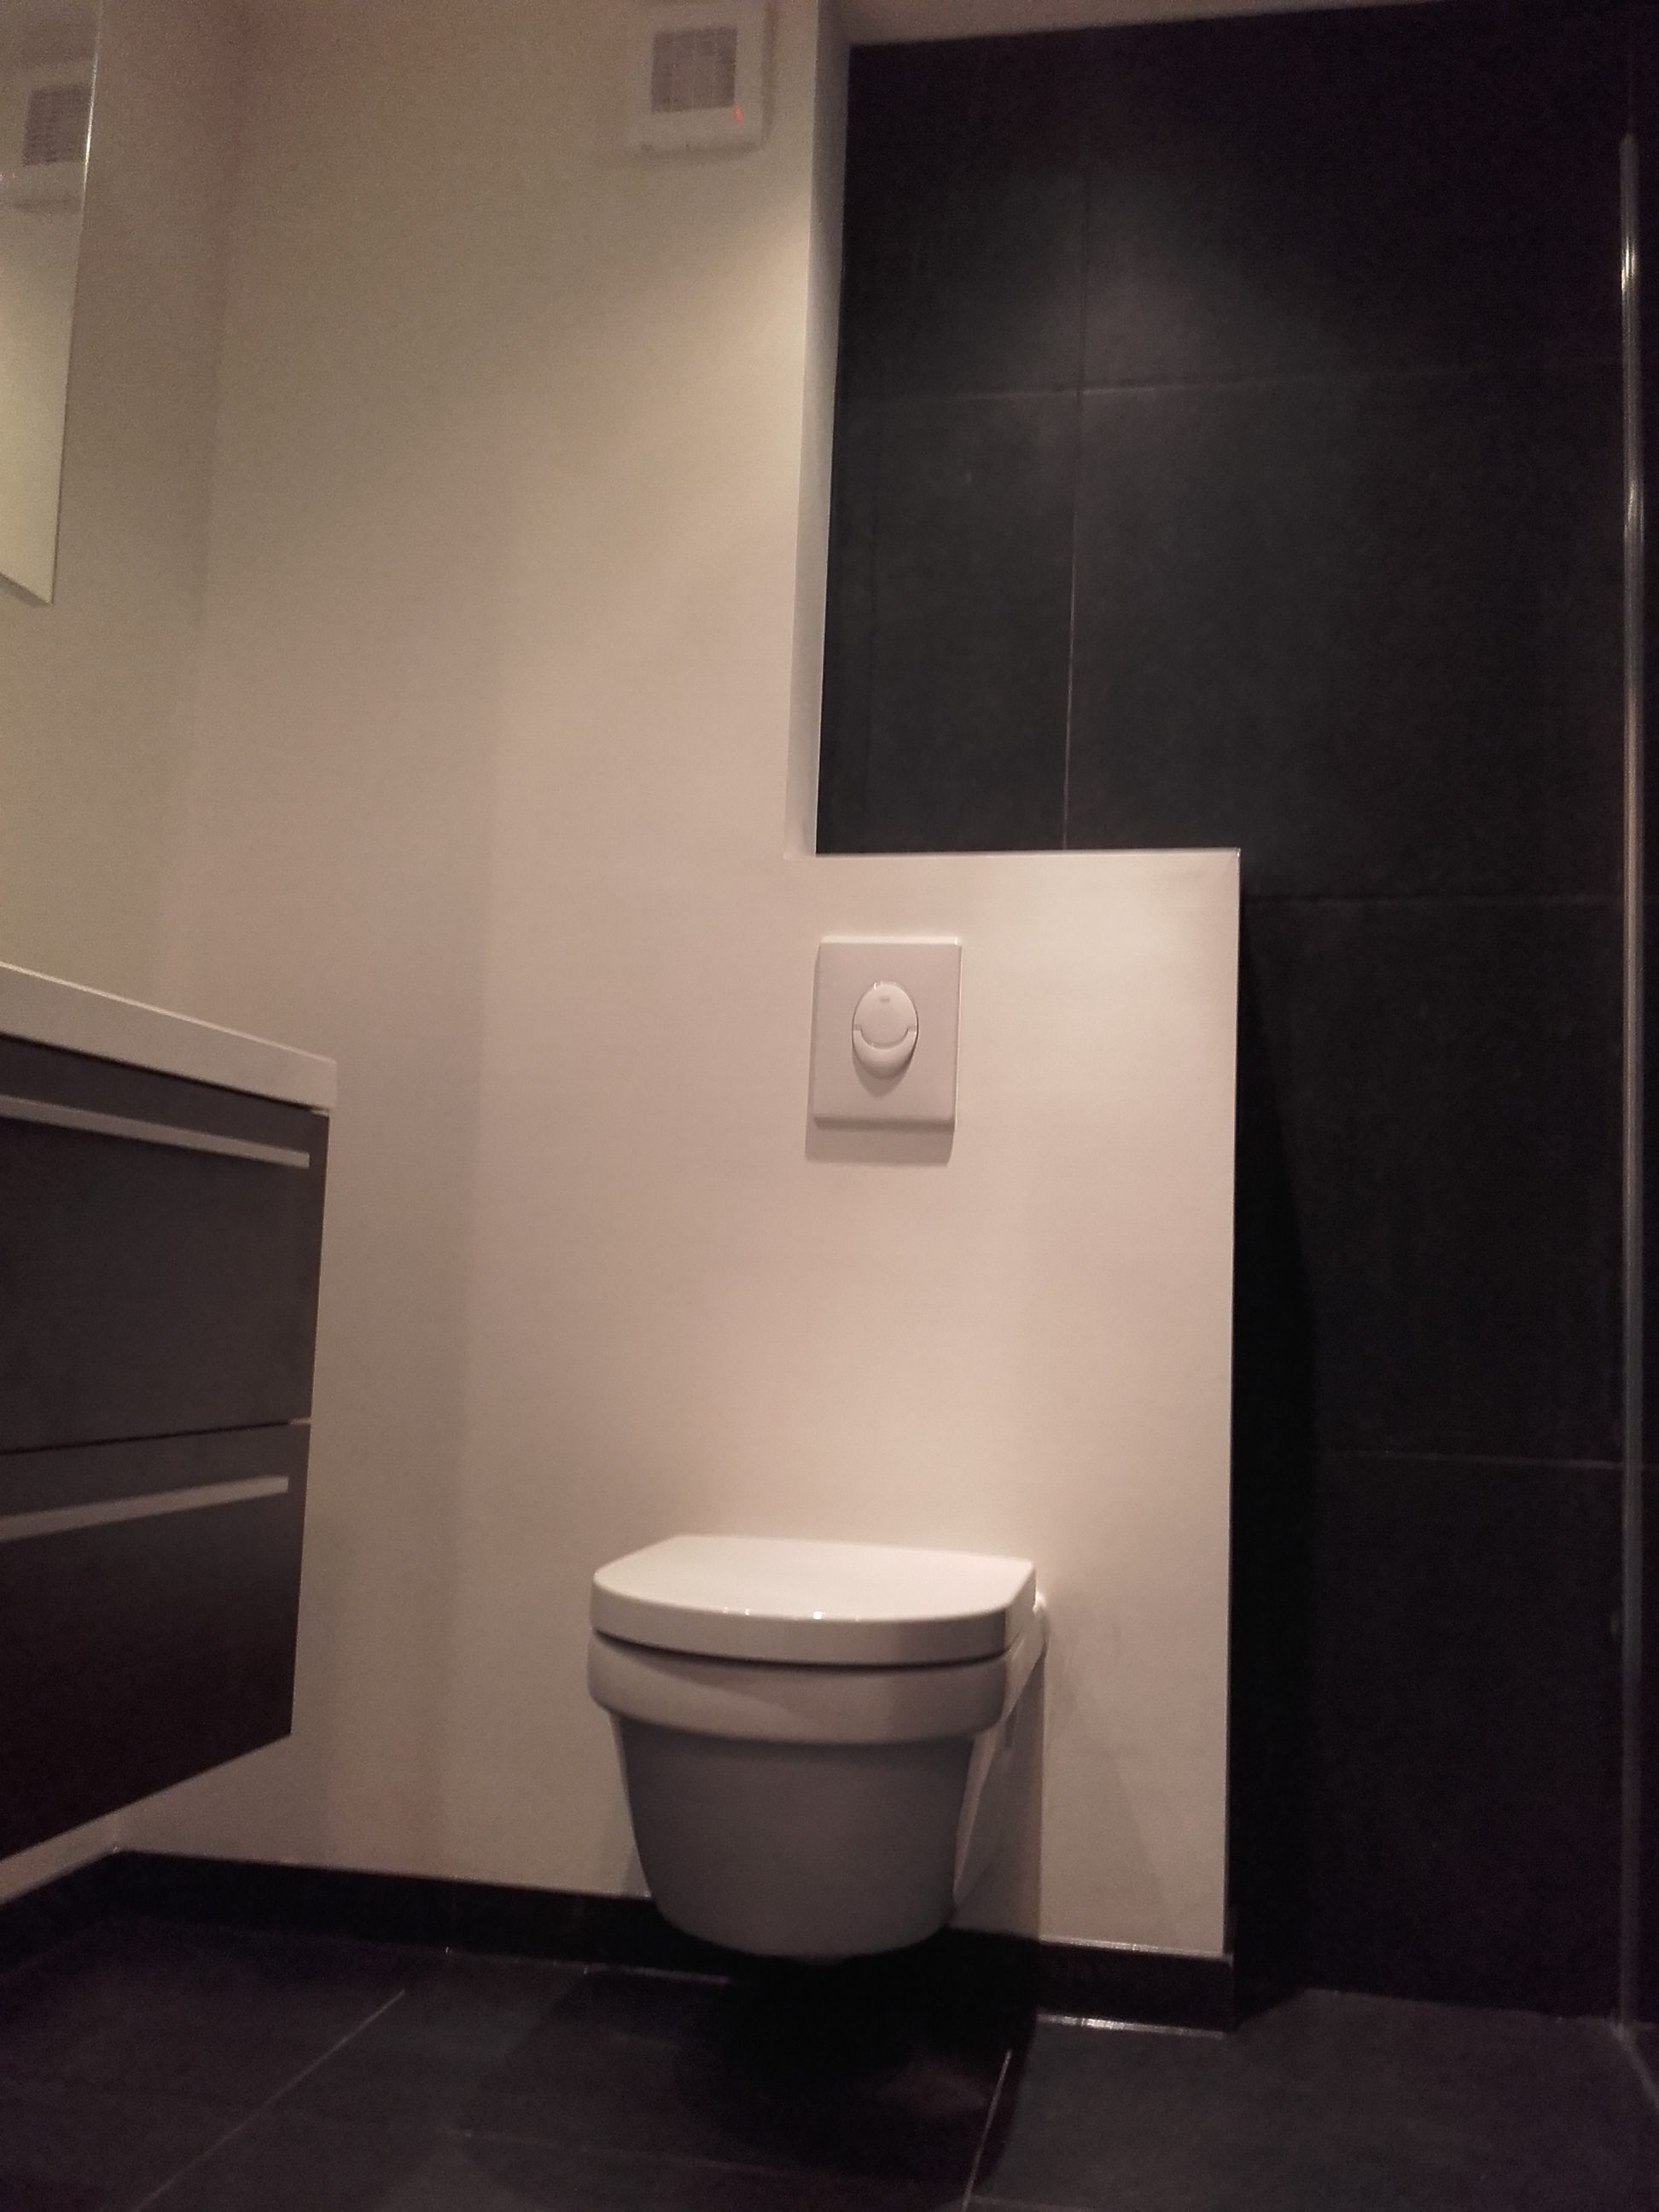 Badkamer verbouwen klusjesman rotterdam - Badkamer wc ...